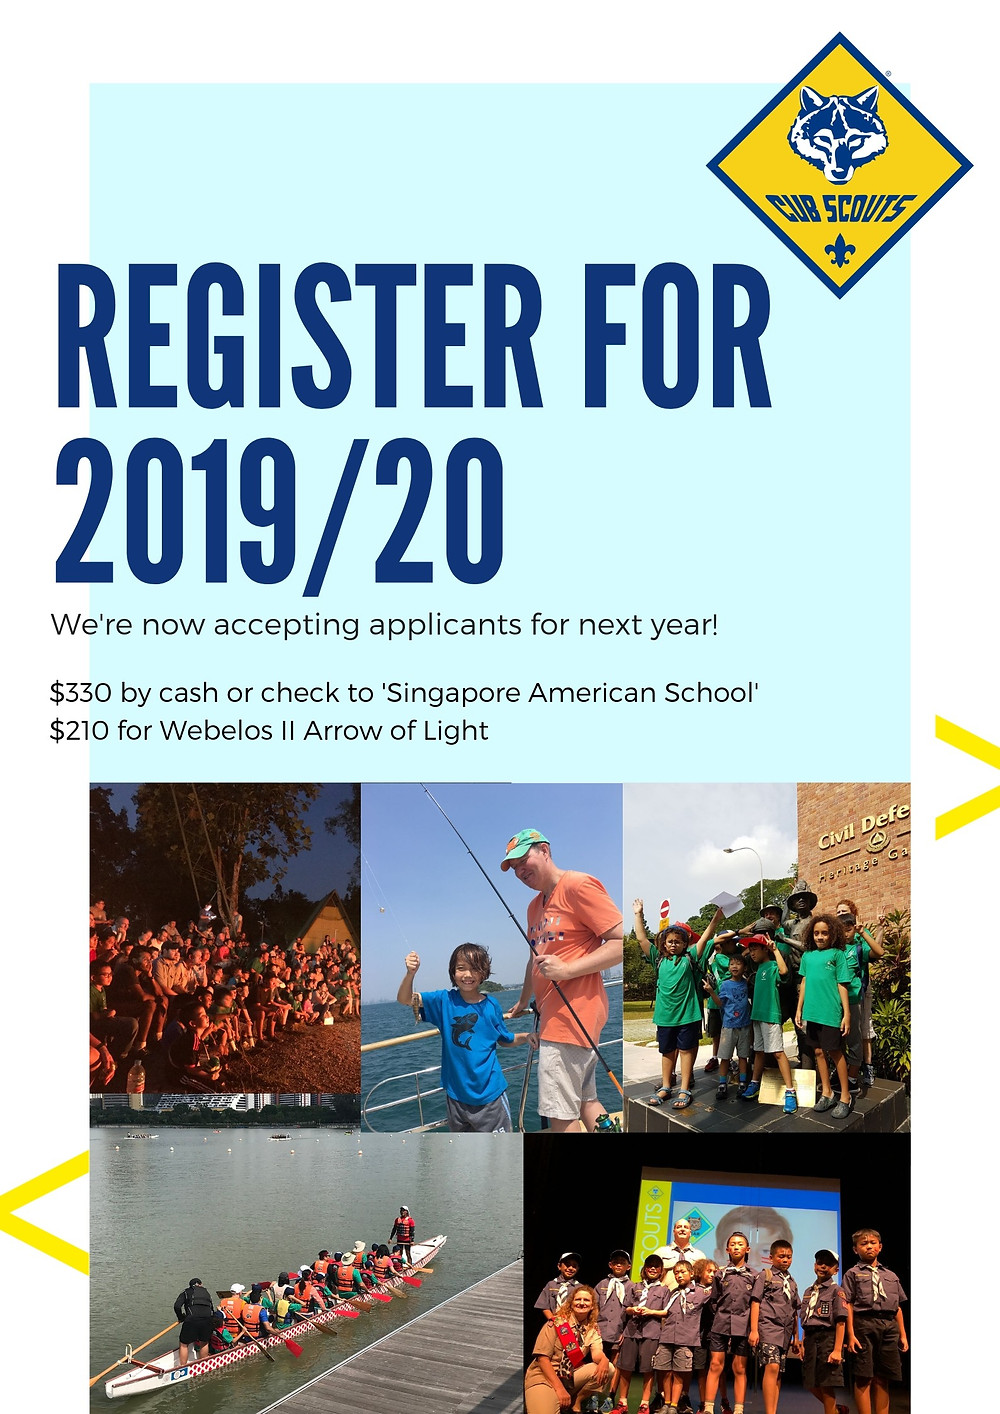 BSA Cub Scouts Pack 3017 Singapore